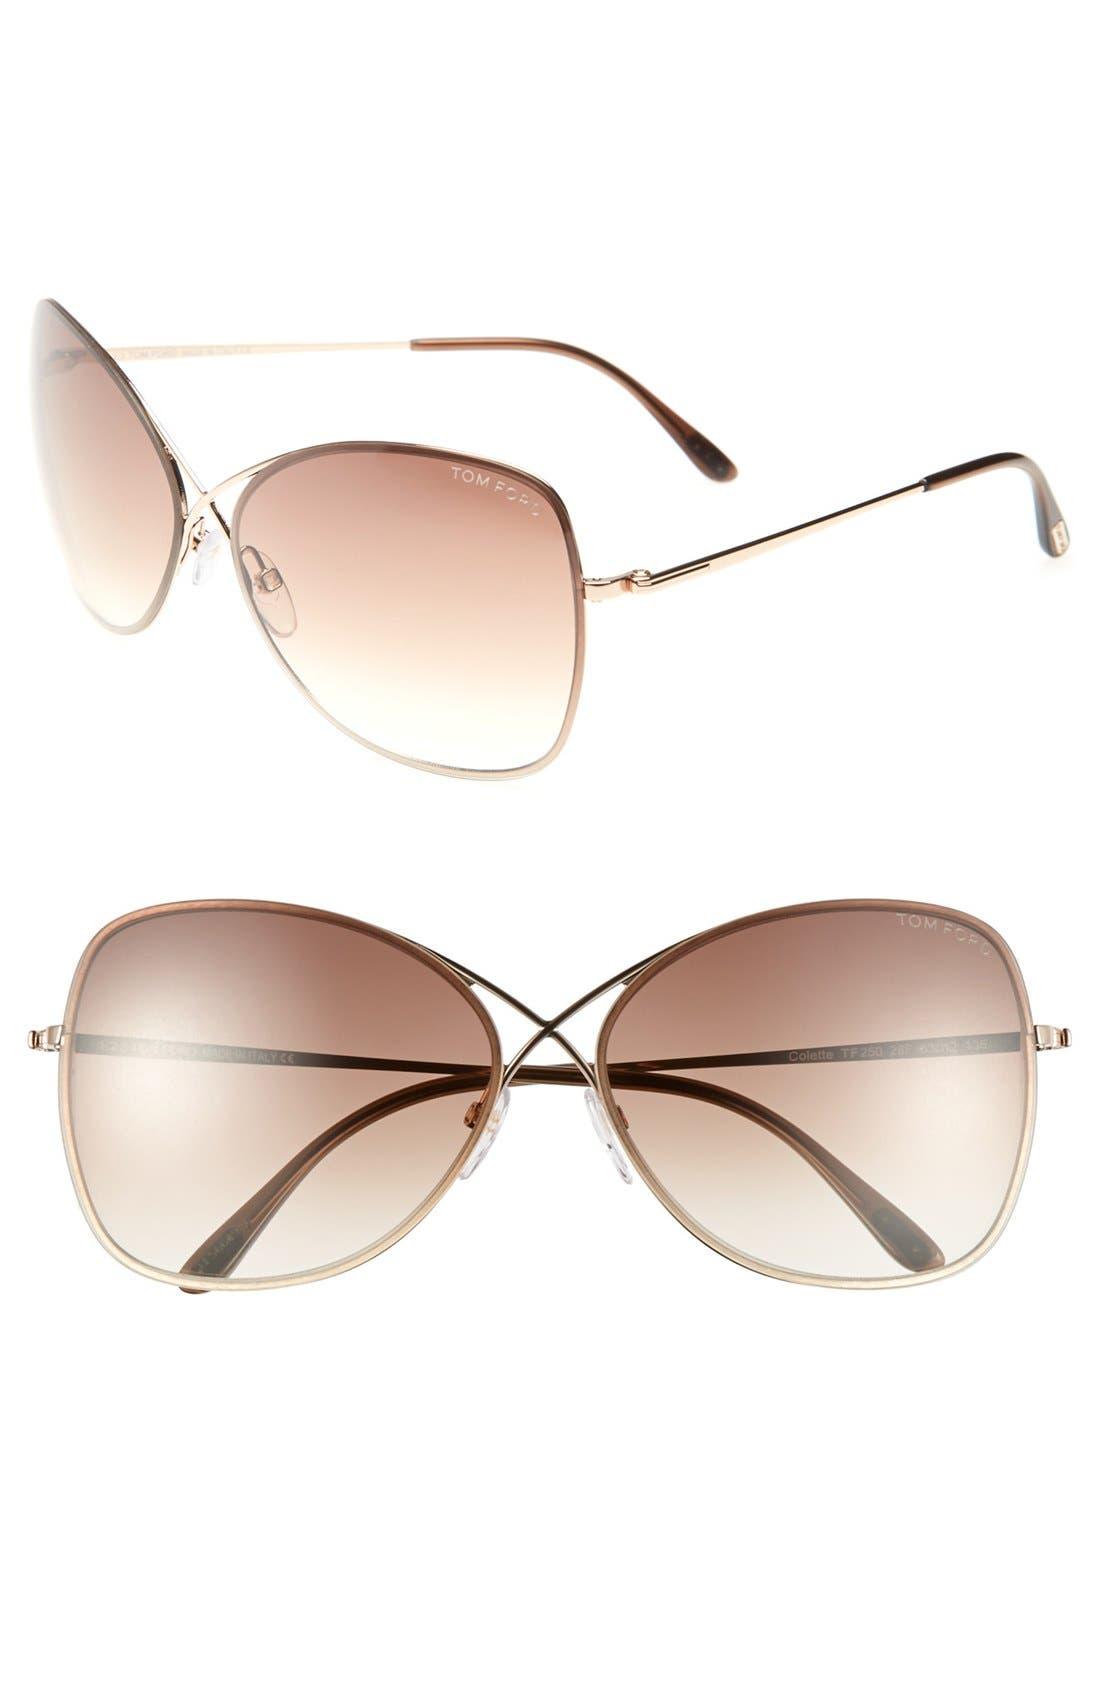 'Colette' 63mm Oversize Sunglasses,                         Main,                         color, Shiny Rose Gold/ Dark Brown